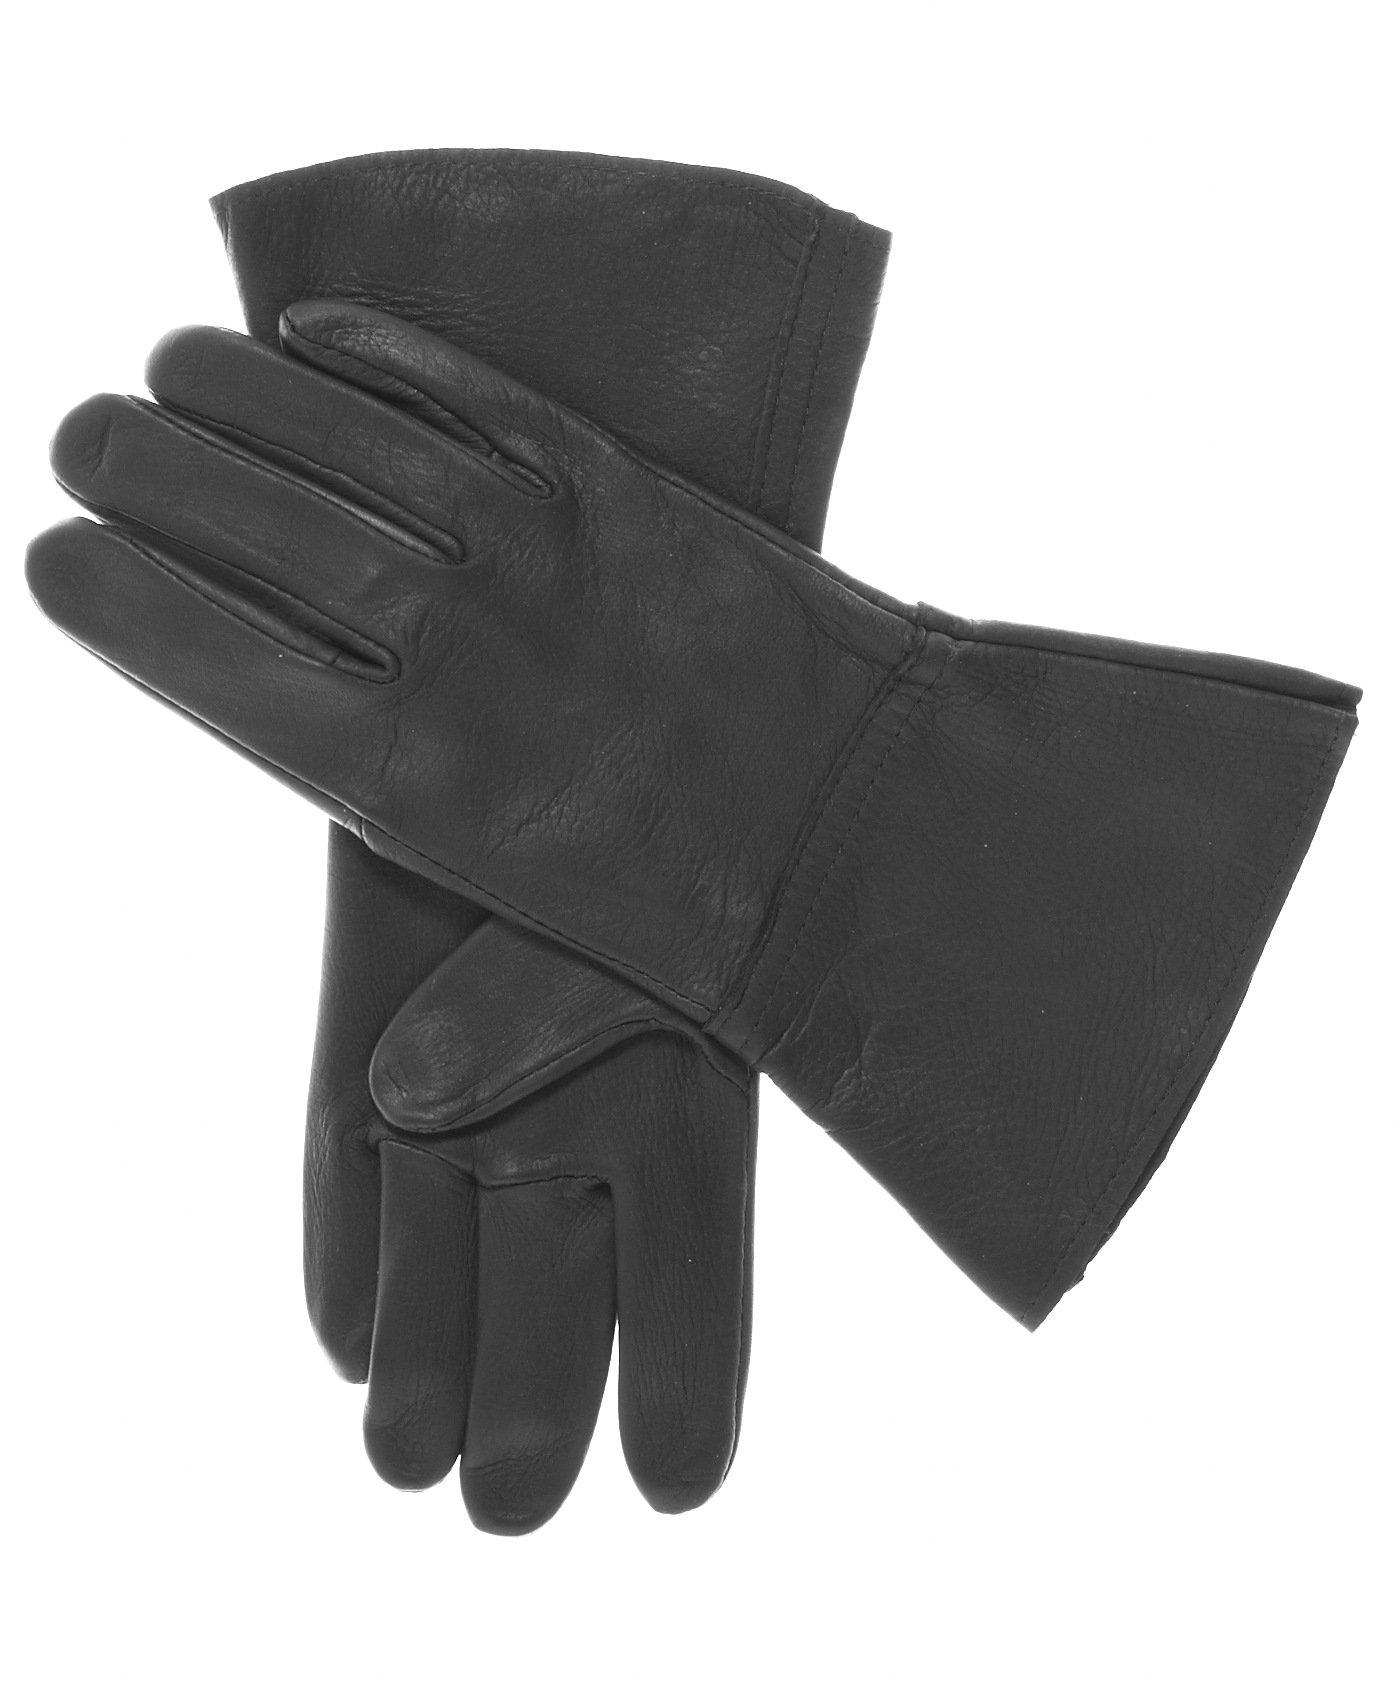 Geier Glove Men's Deerskin Gauntlets Size 7 Color Black